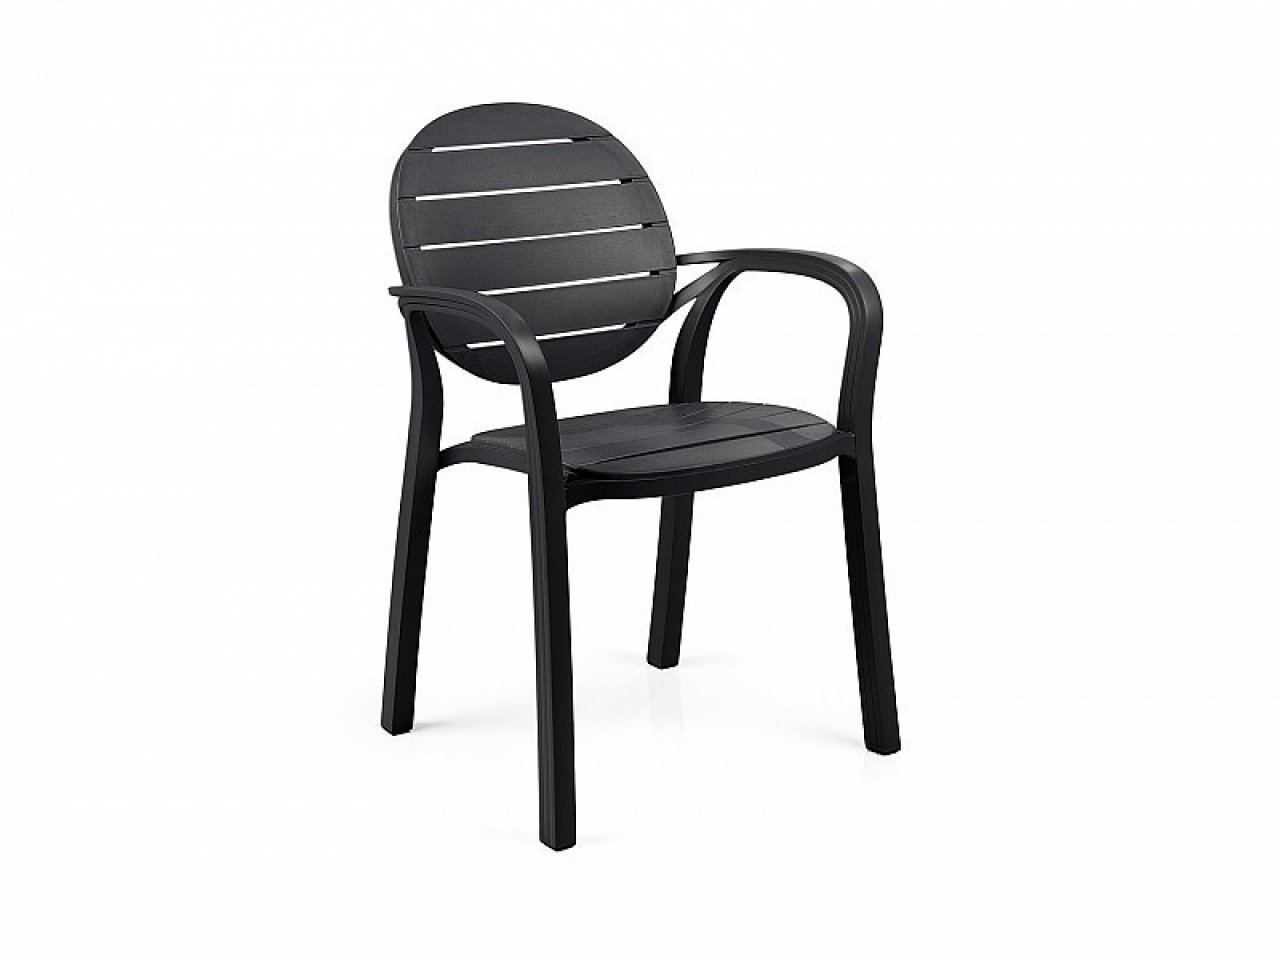 Sedia Con Braccioli Palma -3